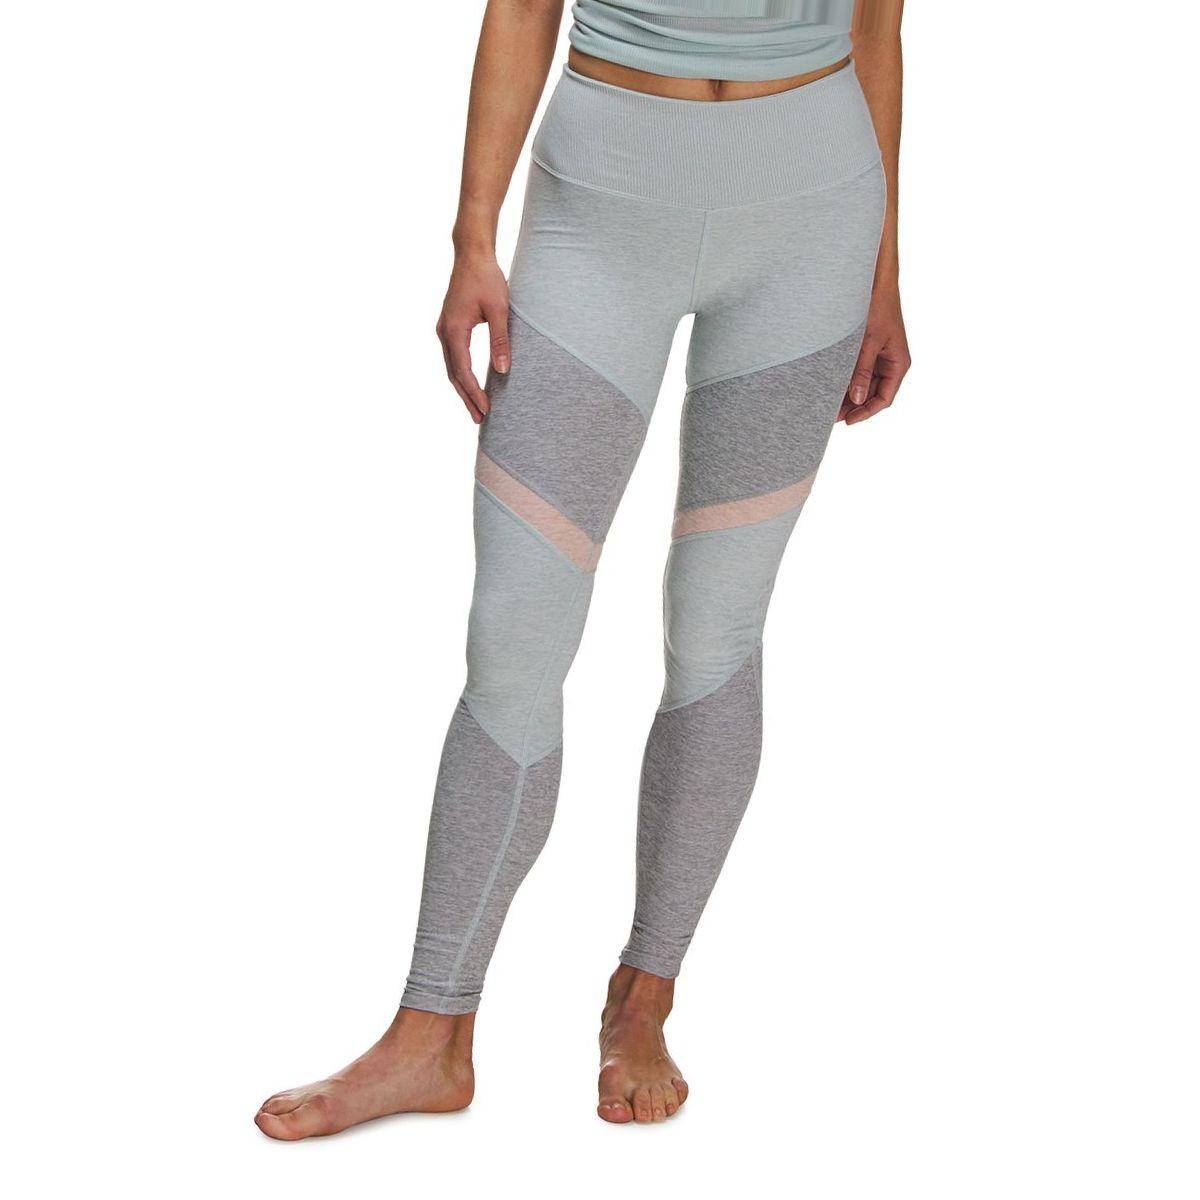 Alo Yoga High-Waisted Alosoft Sheila Legging - Women's